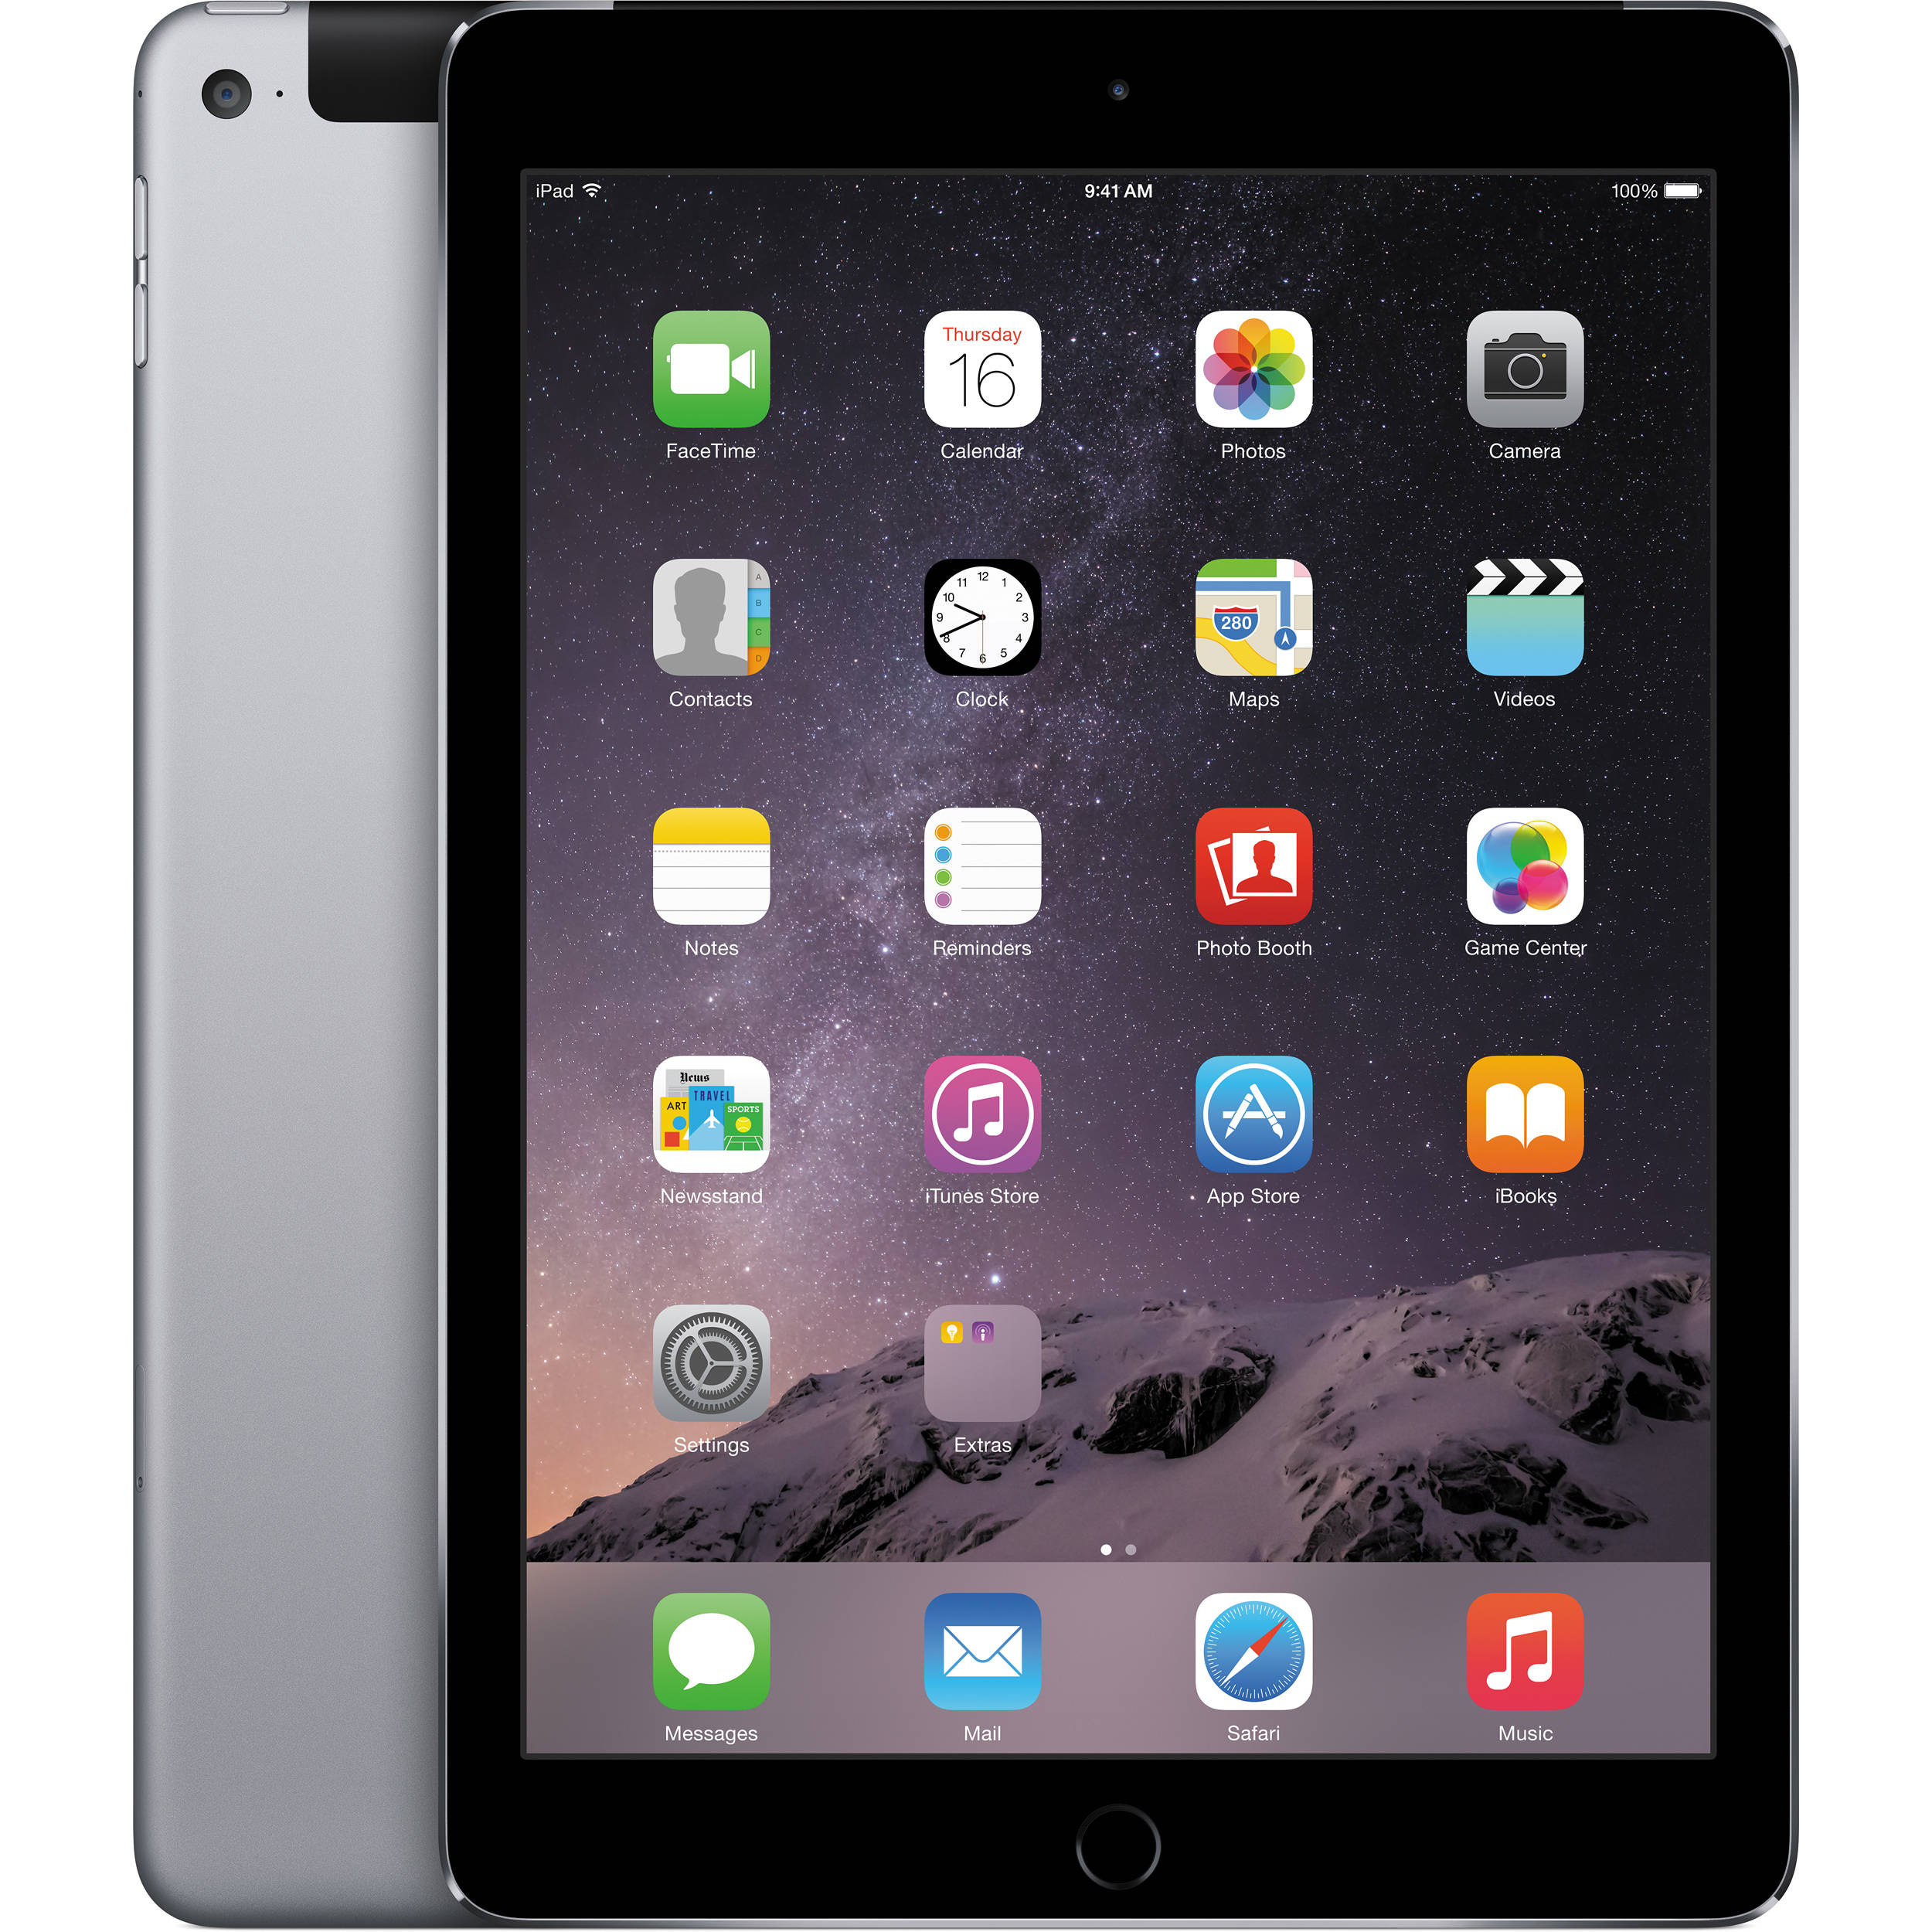 apple 16gb ipad air 2 wi fi 4g lte space gray mh2u2ll. Black Bedroom Furniture Sets. Home Design Ideas